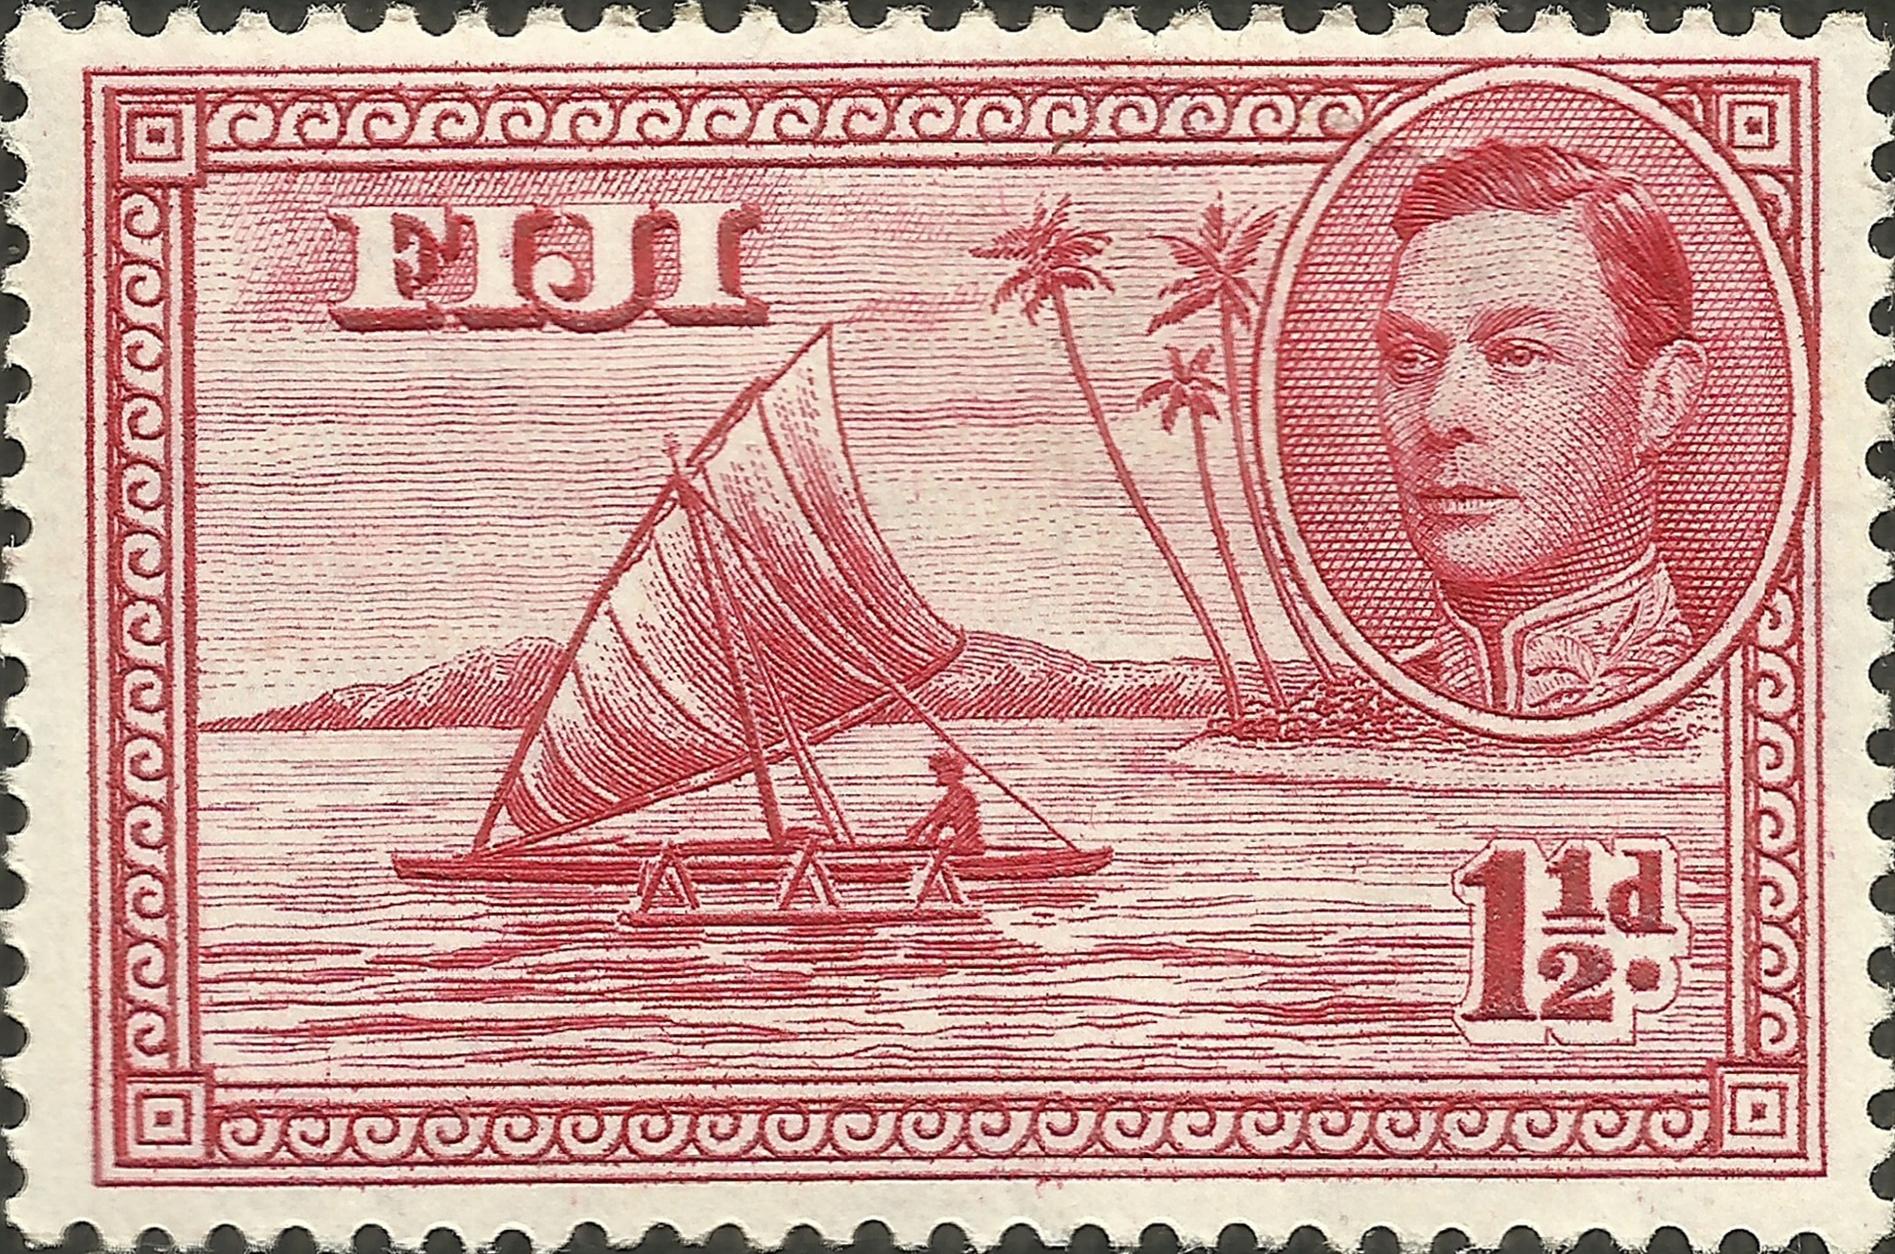 Fiji - Scott #132 (1940)